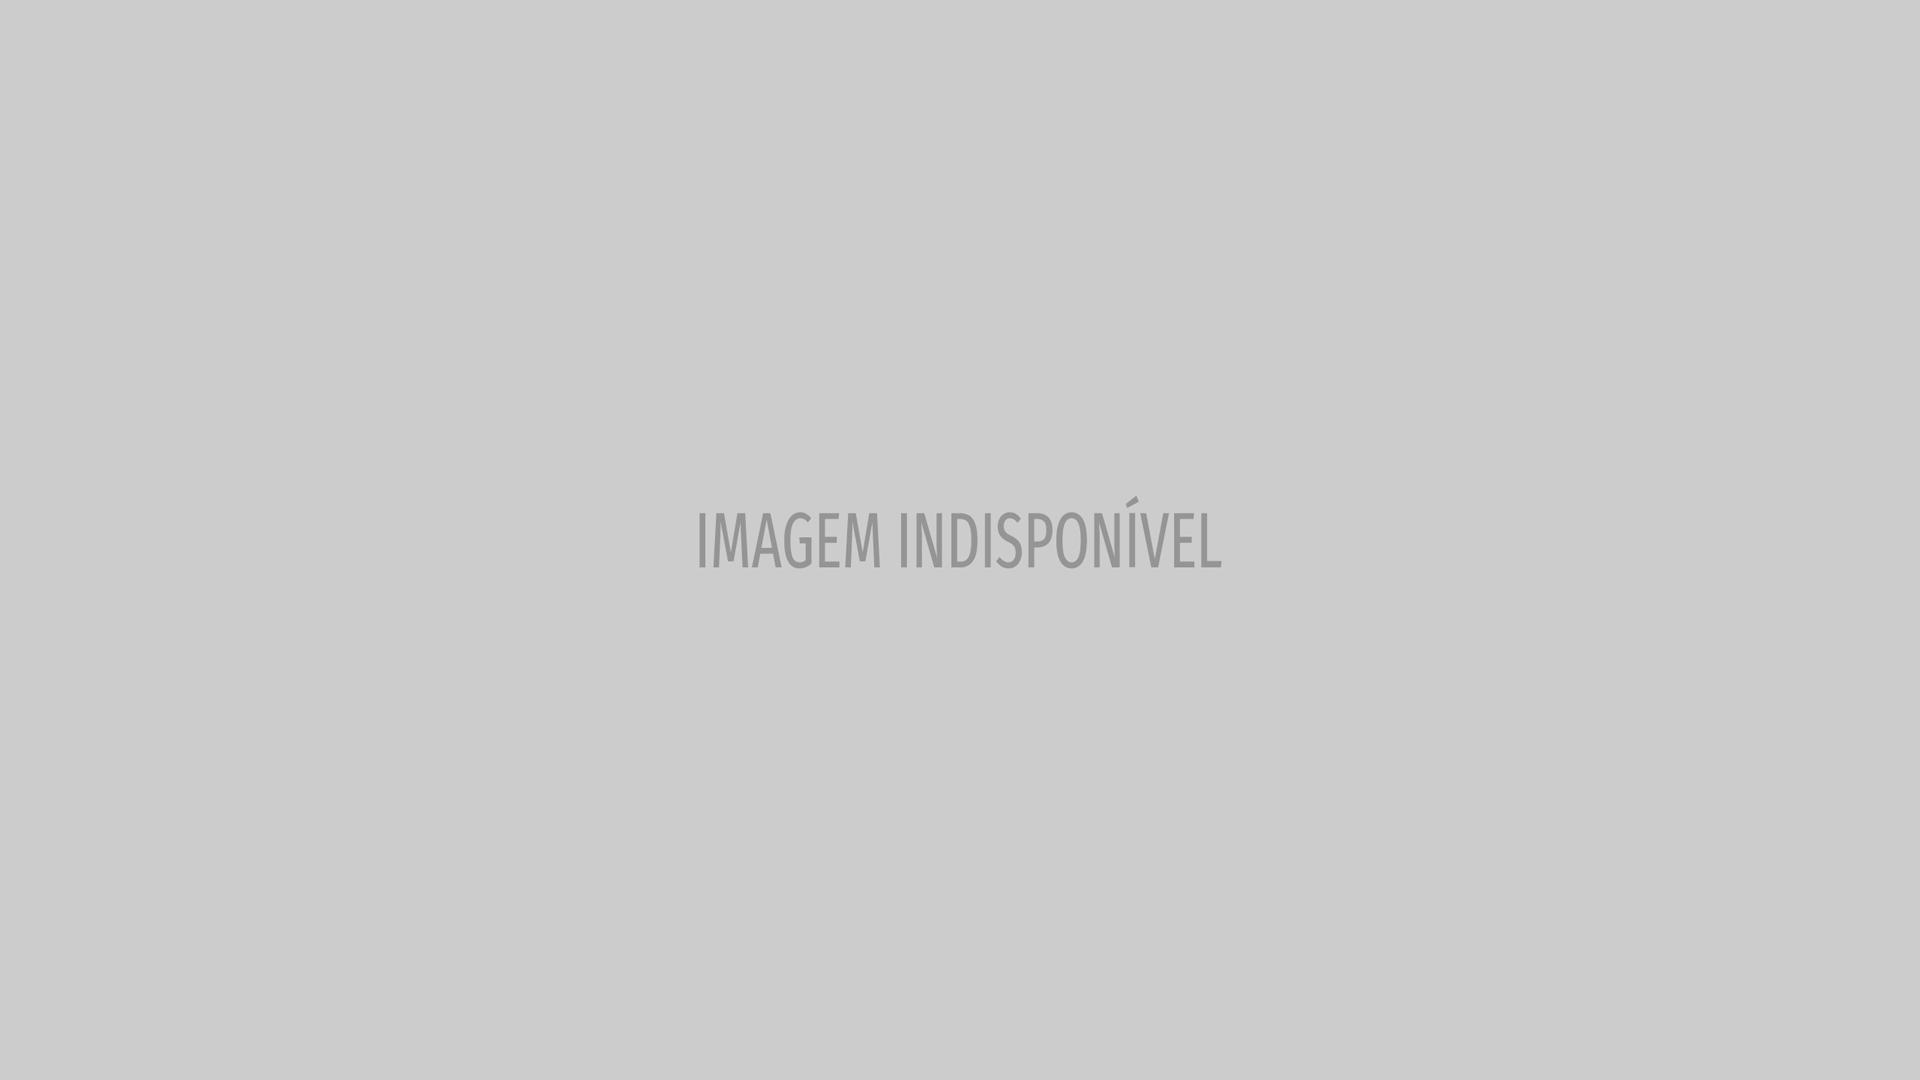 Socialite que ofendeu Titi pede desculpas: 'Efeito de remédios fortes'